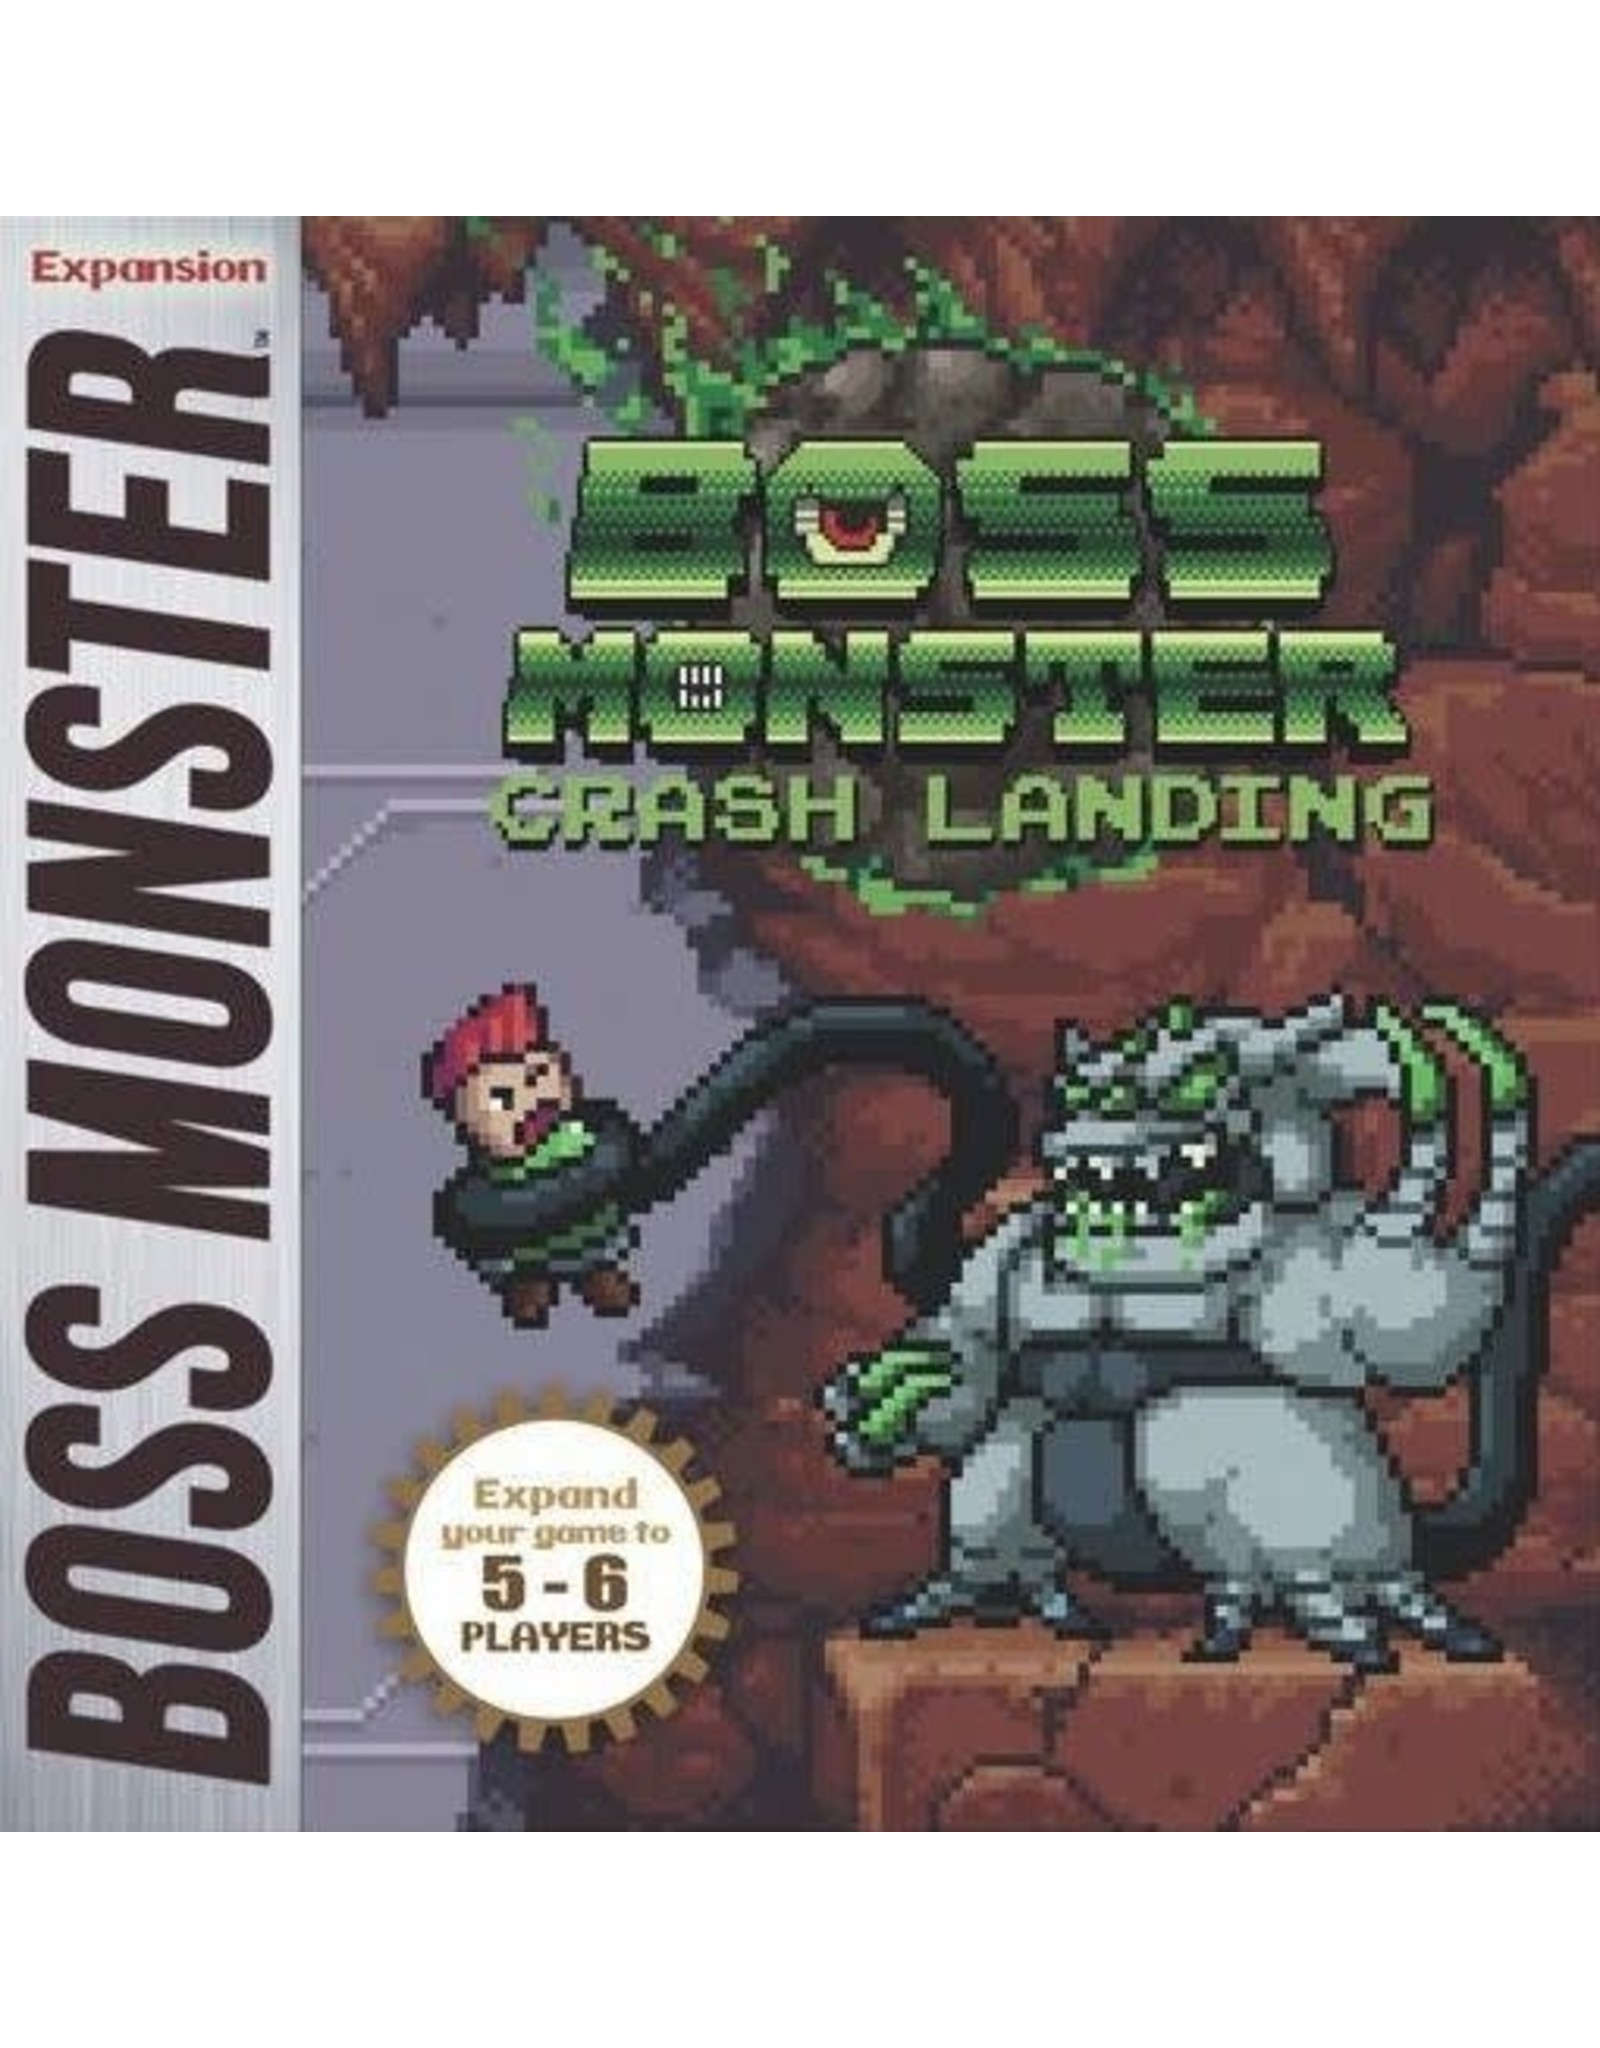 Boss Monster - Crash Landing Expansion Clearance